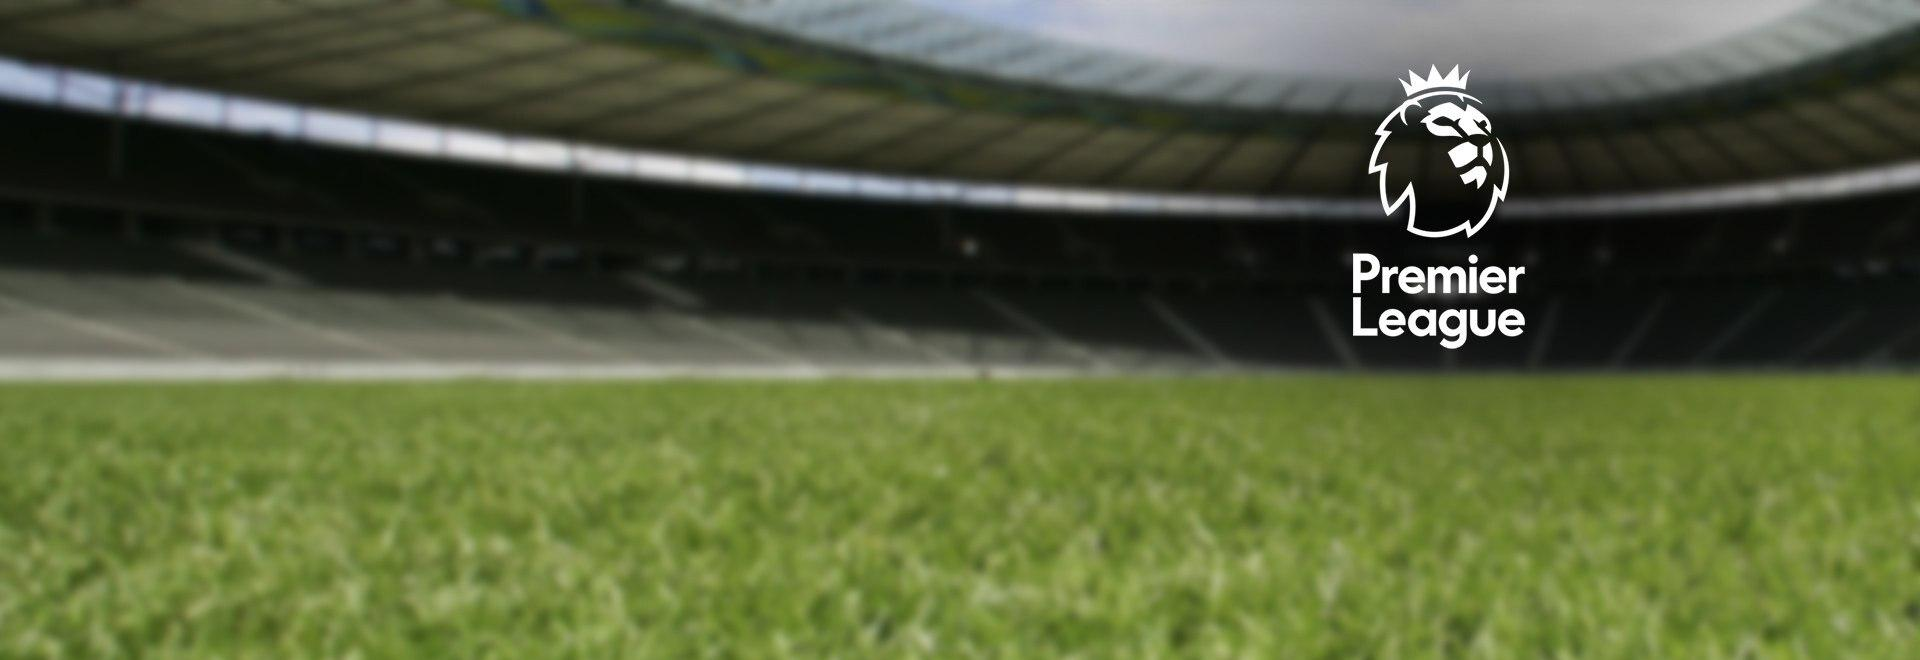 Newcastle - Aston Villa. 28a g.